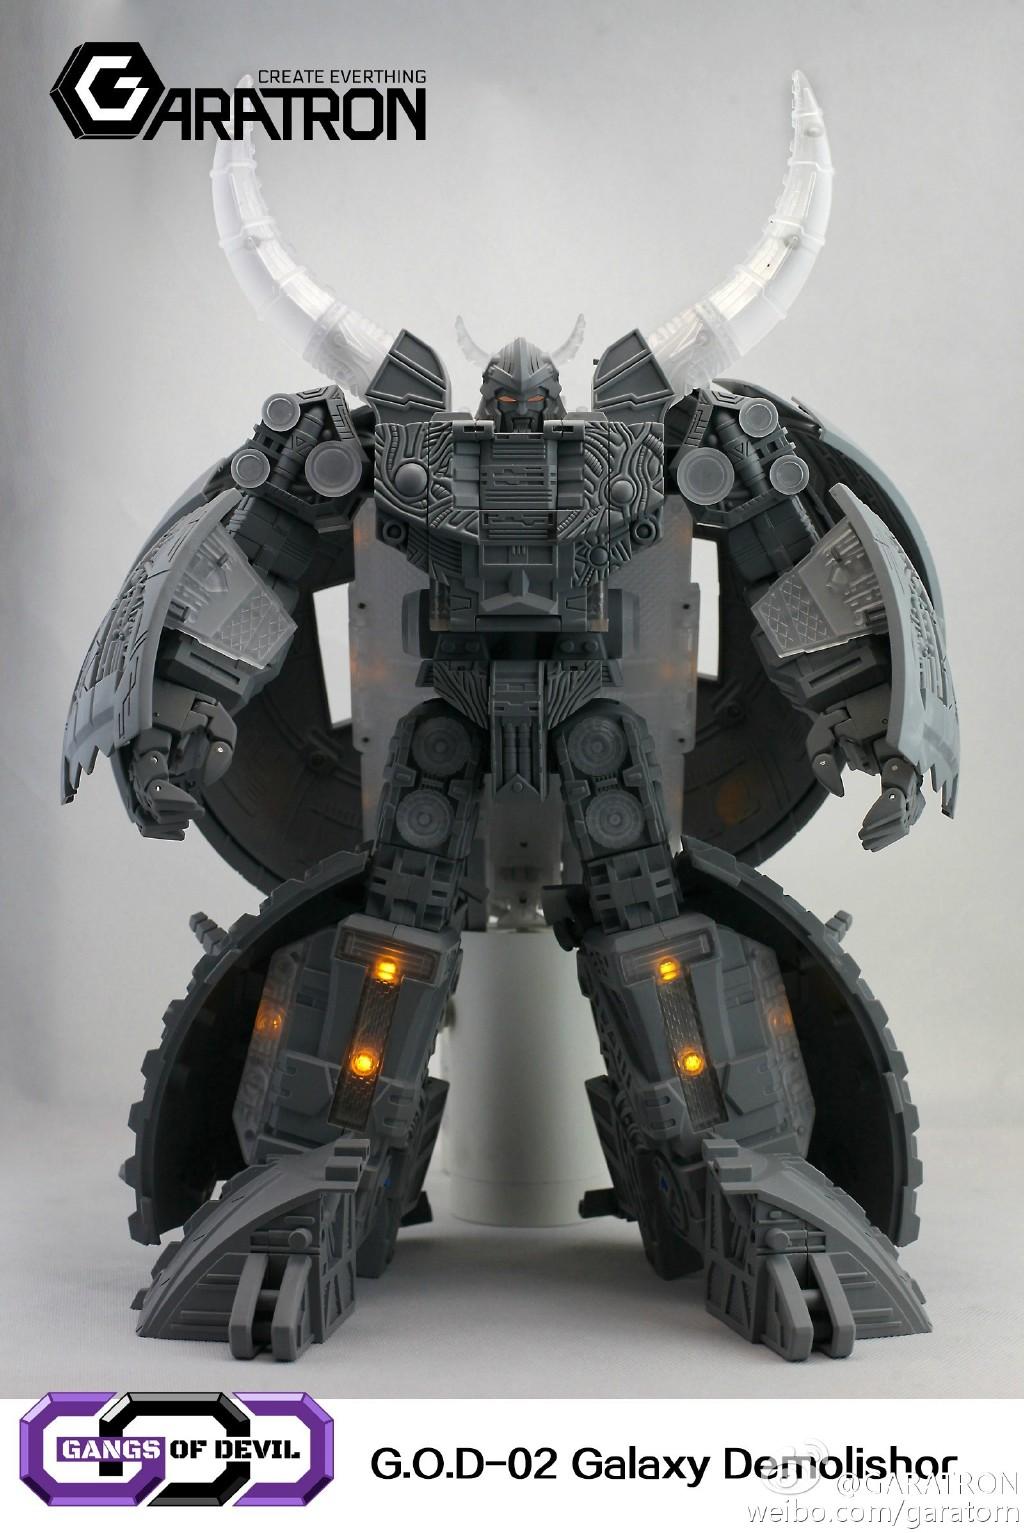 [Garatron] Produit Tiers - Gangs Of Devils G.O.D-02 Galaxy Demolishor - aka Unicron (Beast Wars Neo) Uni1